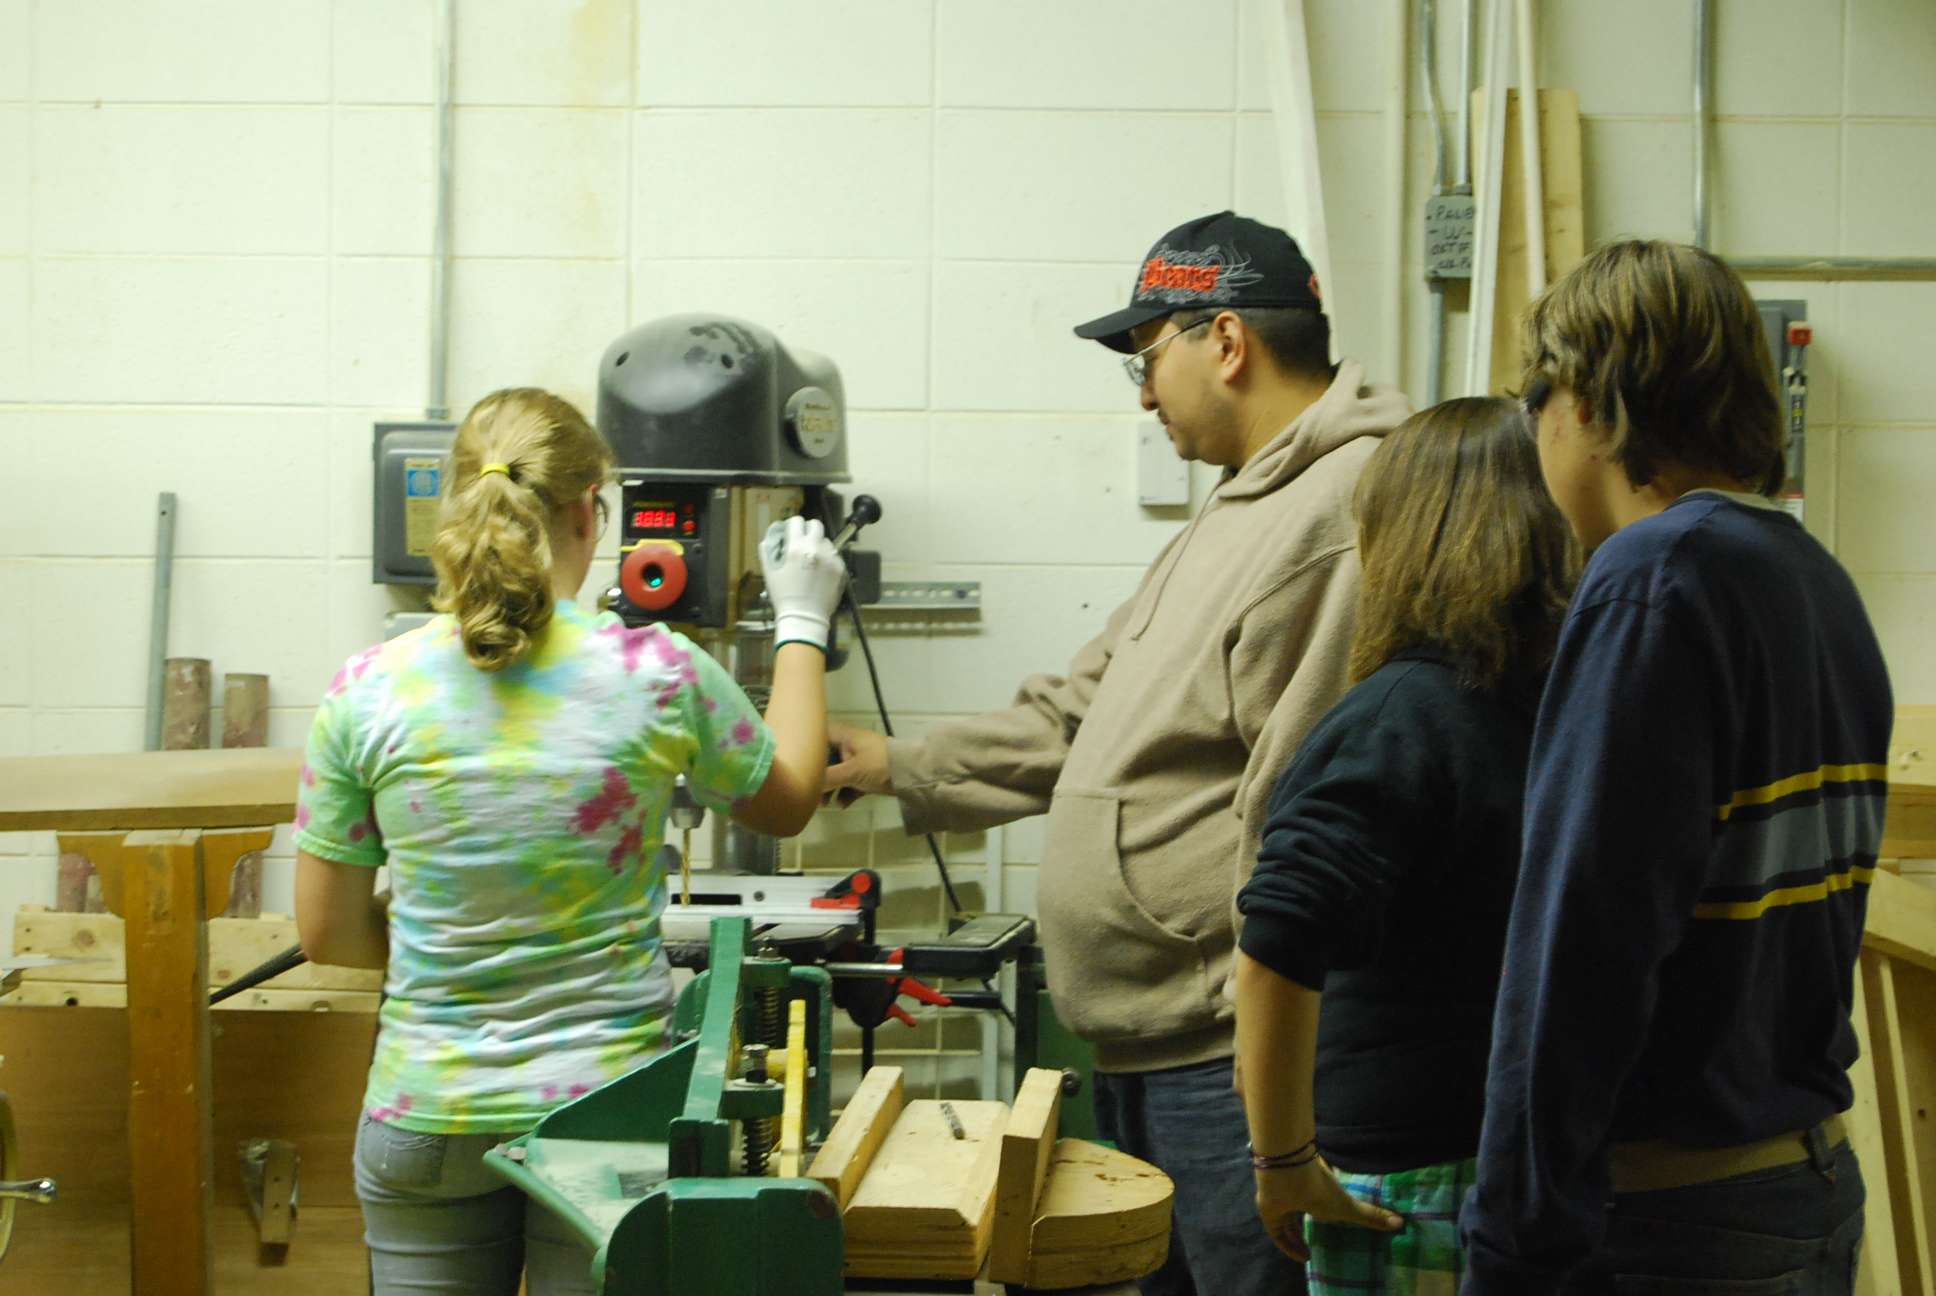 Student using a drill press.